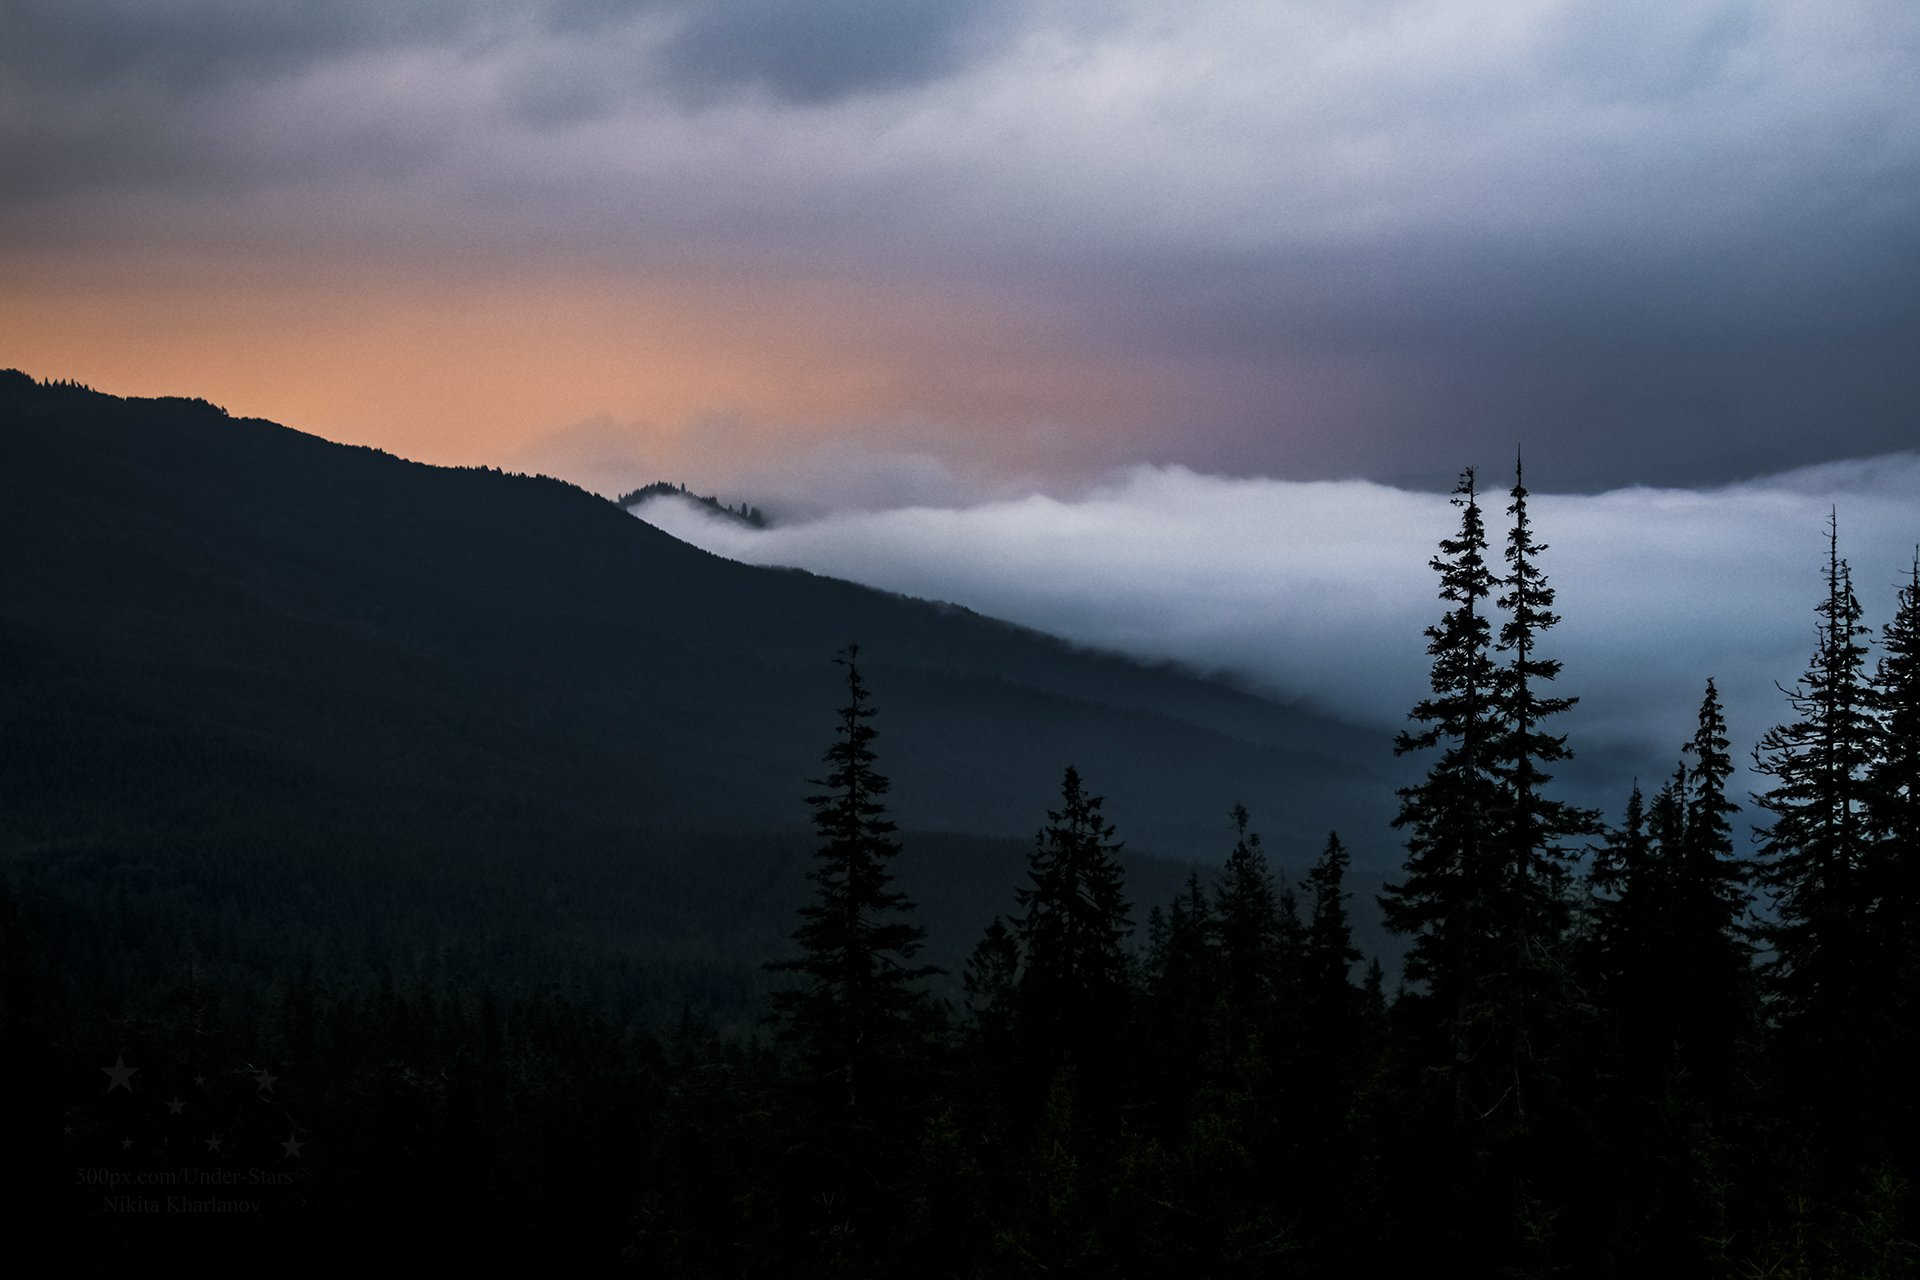 Драгобрат, Карпаты, горы, туман, облака, Украина, Закарпатье , Харланов Никита